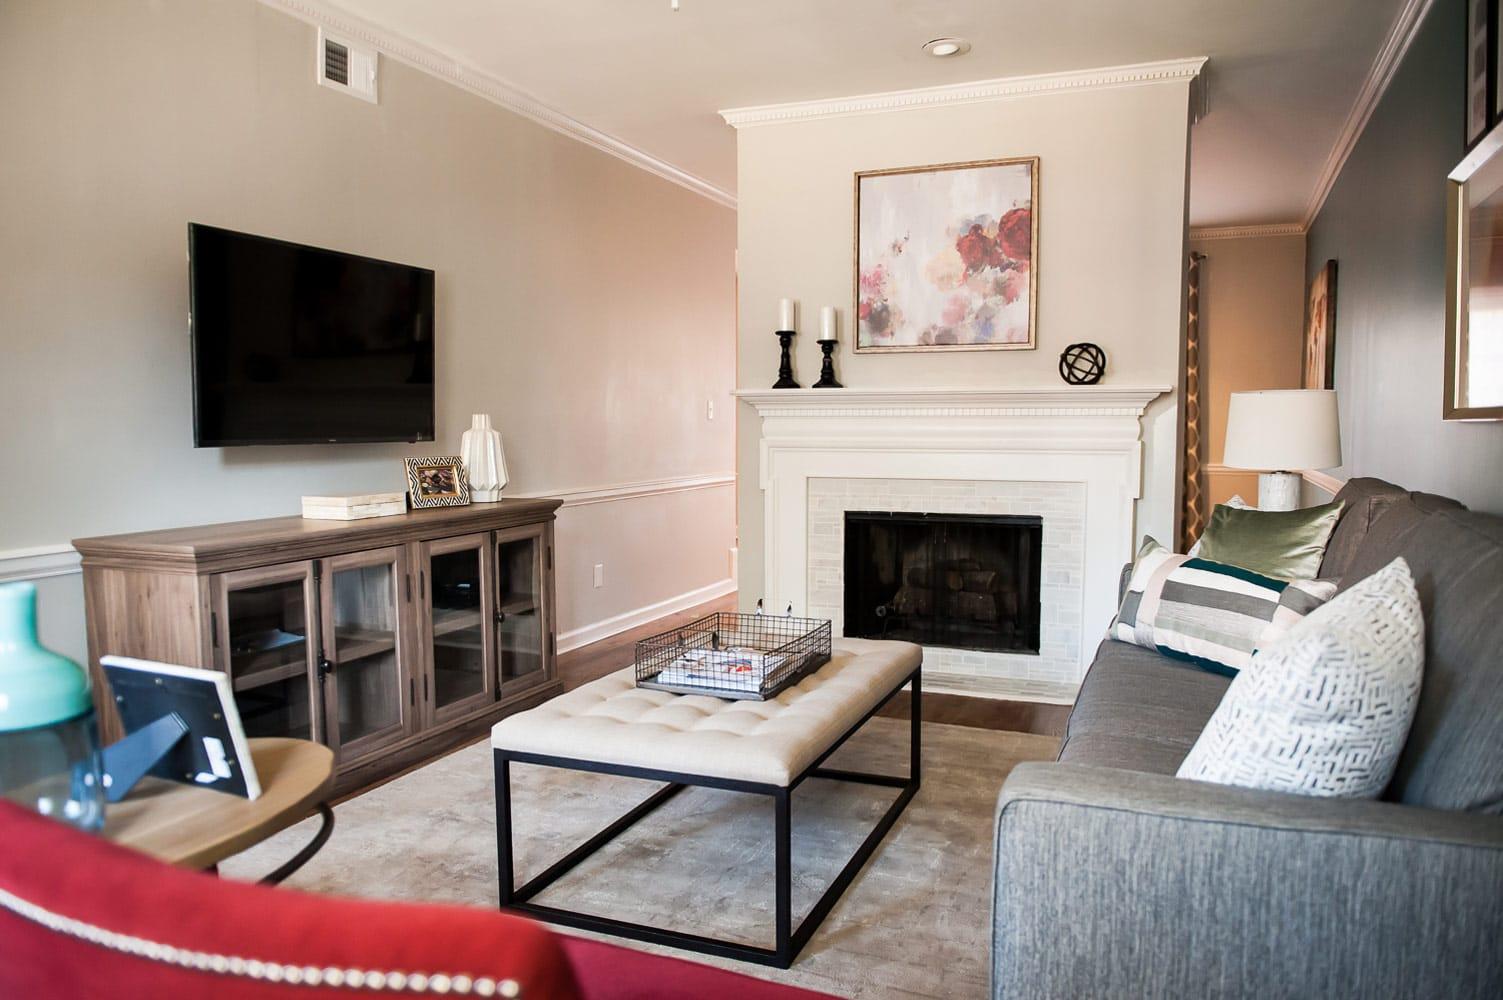 Wieuca Road Atlanta living room interior design